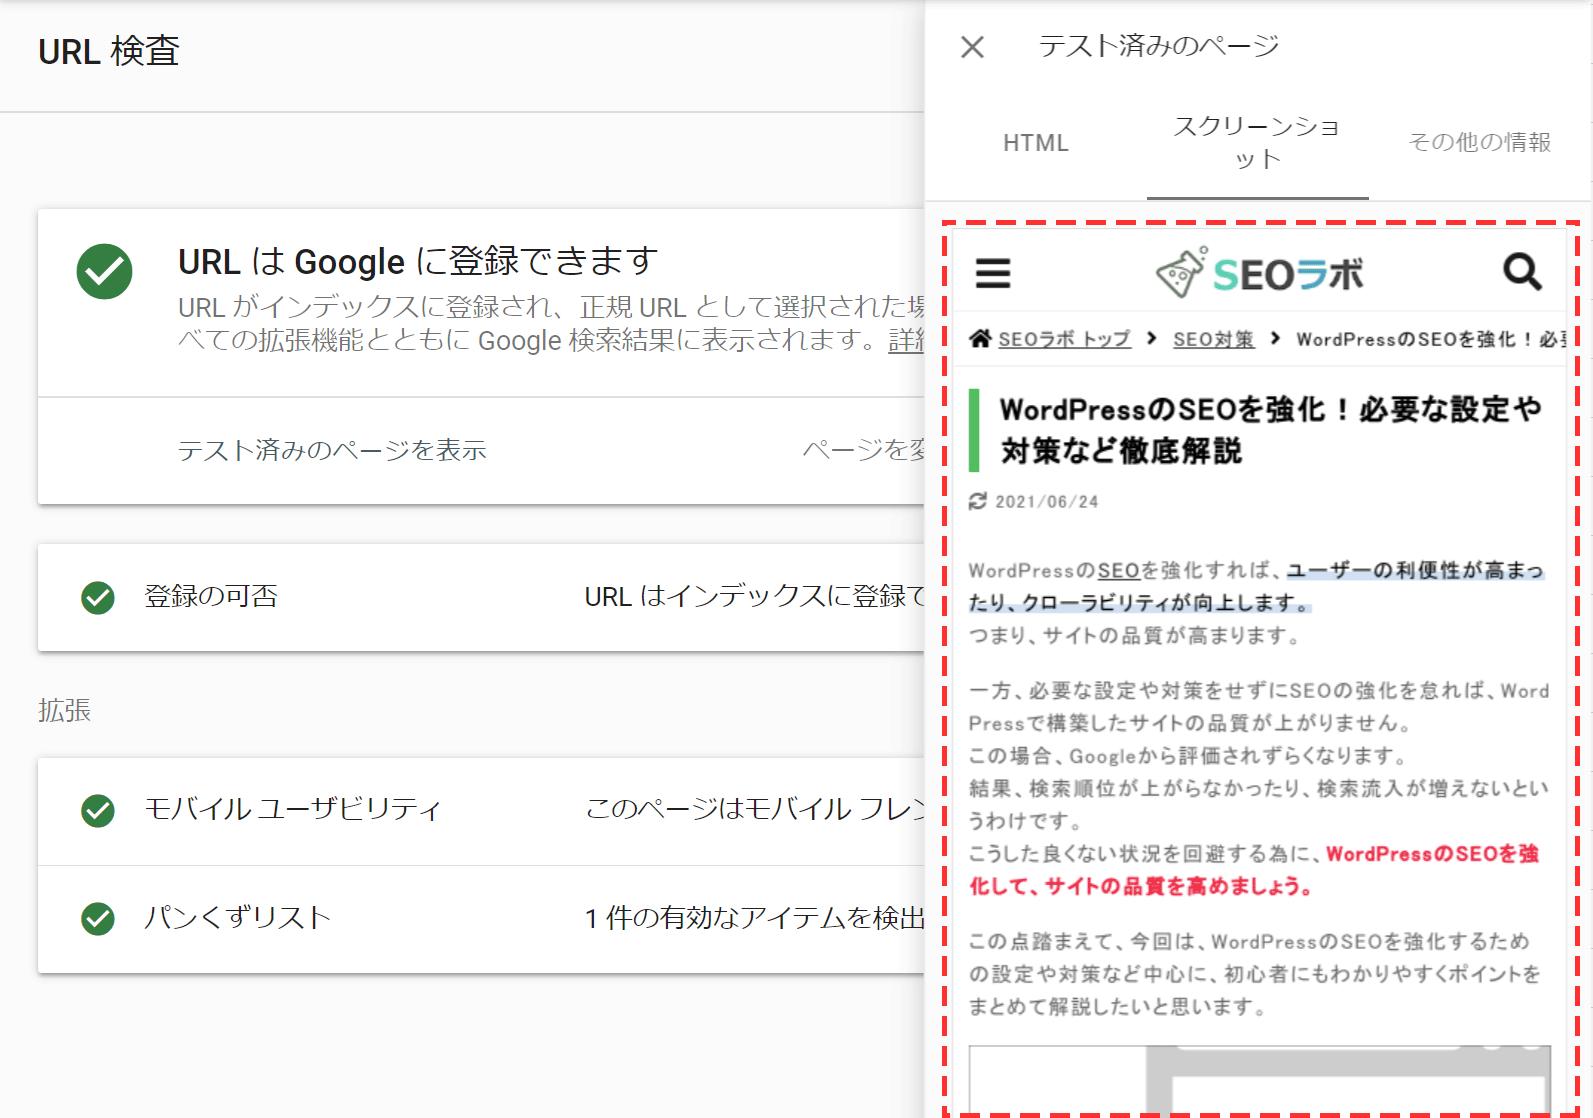 URL検査ツールでレンダリングされたページ情報の表示ができる